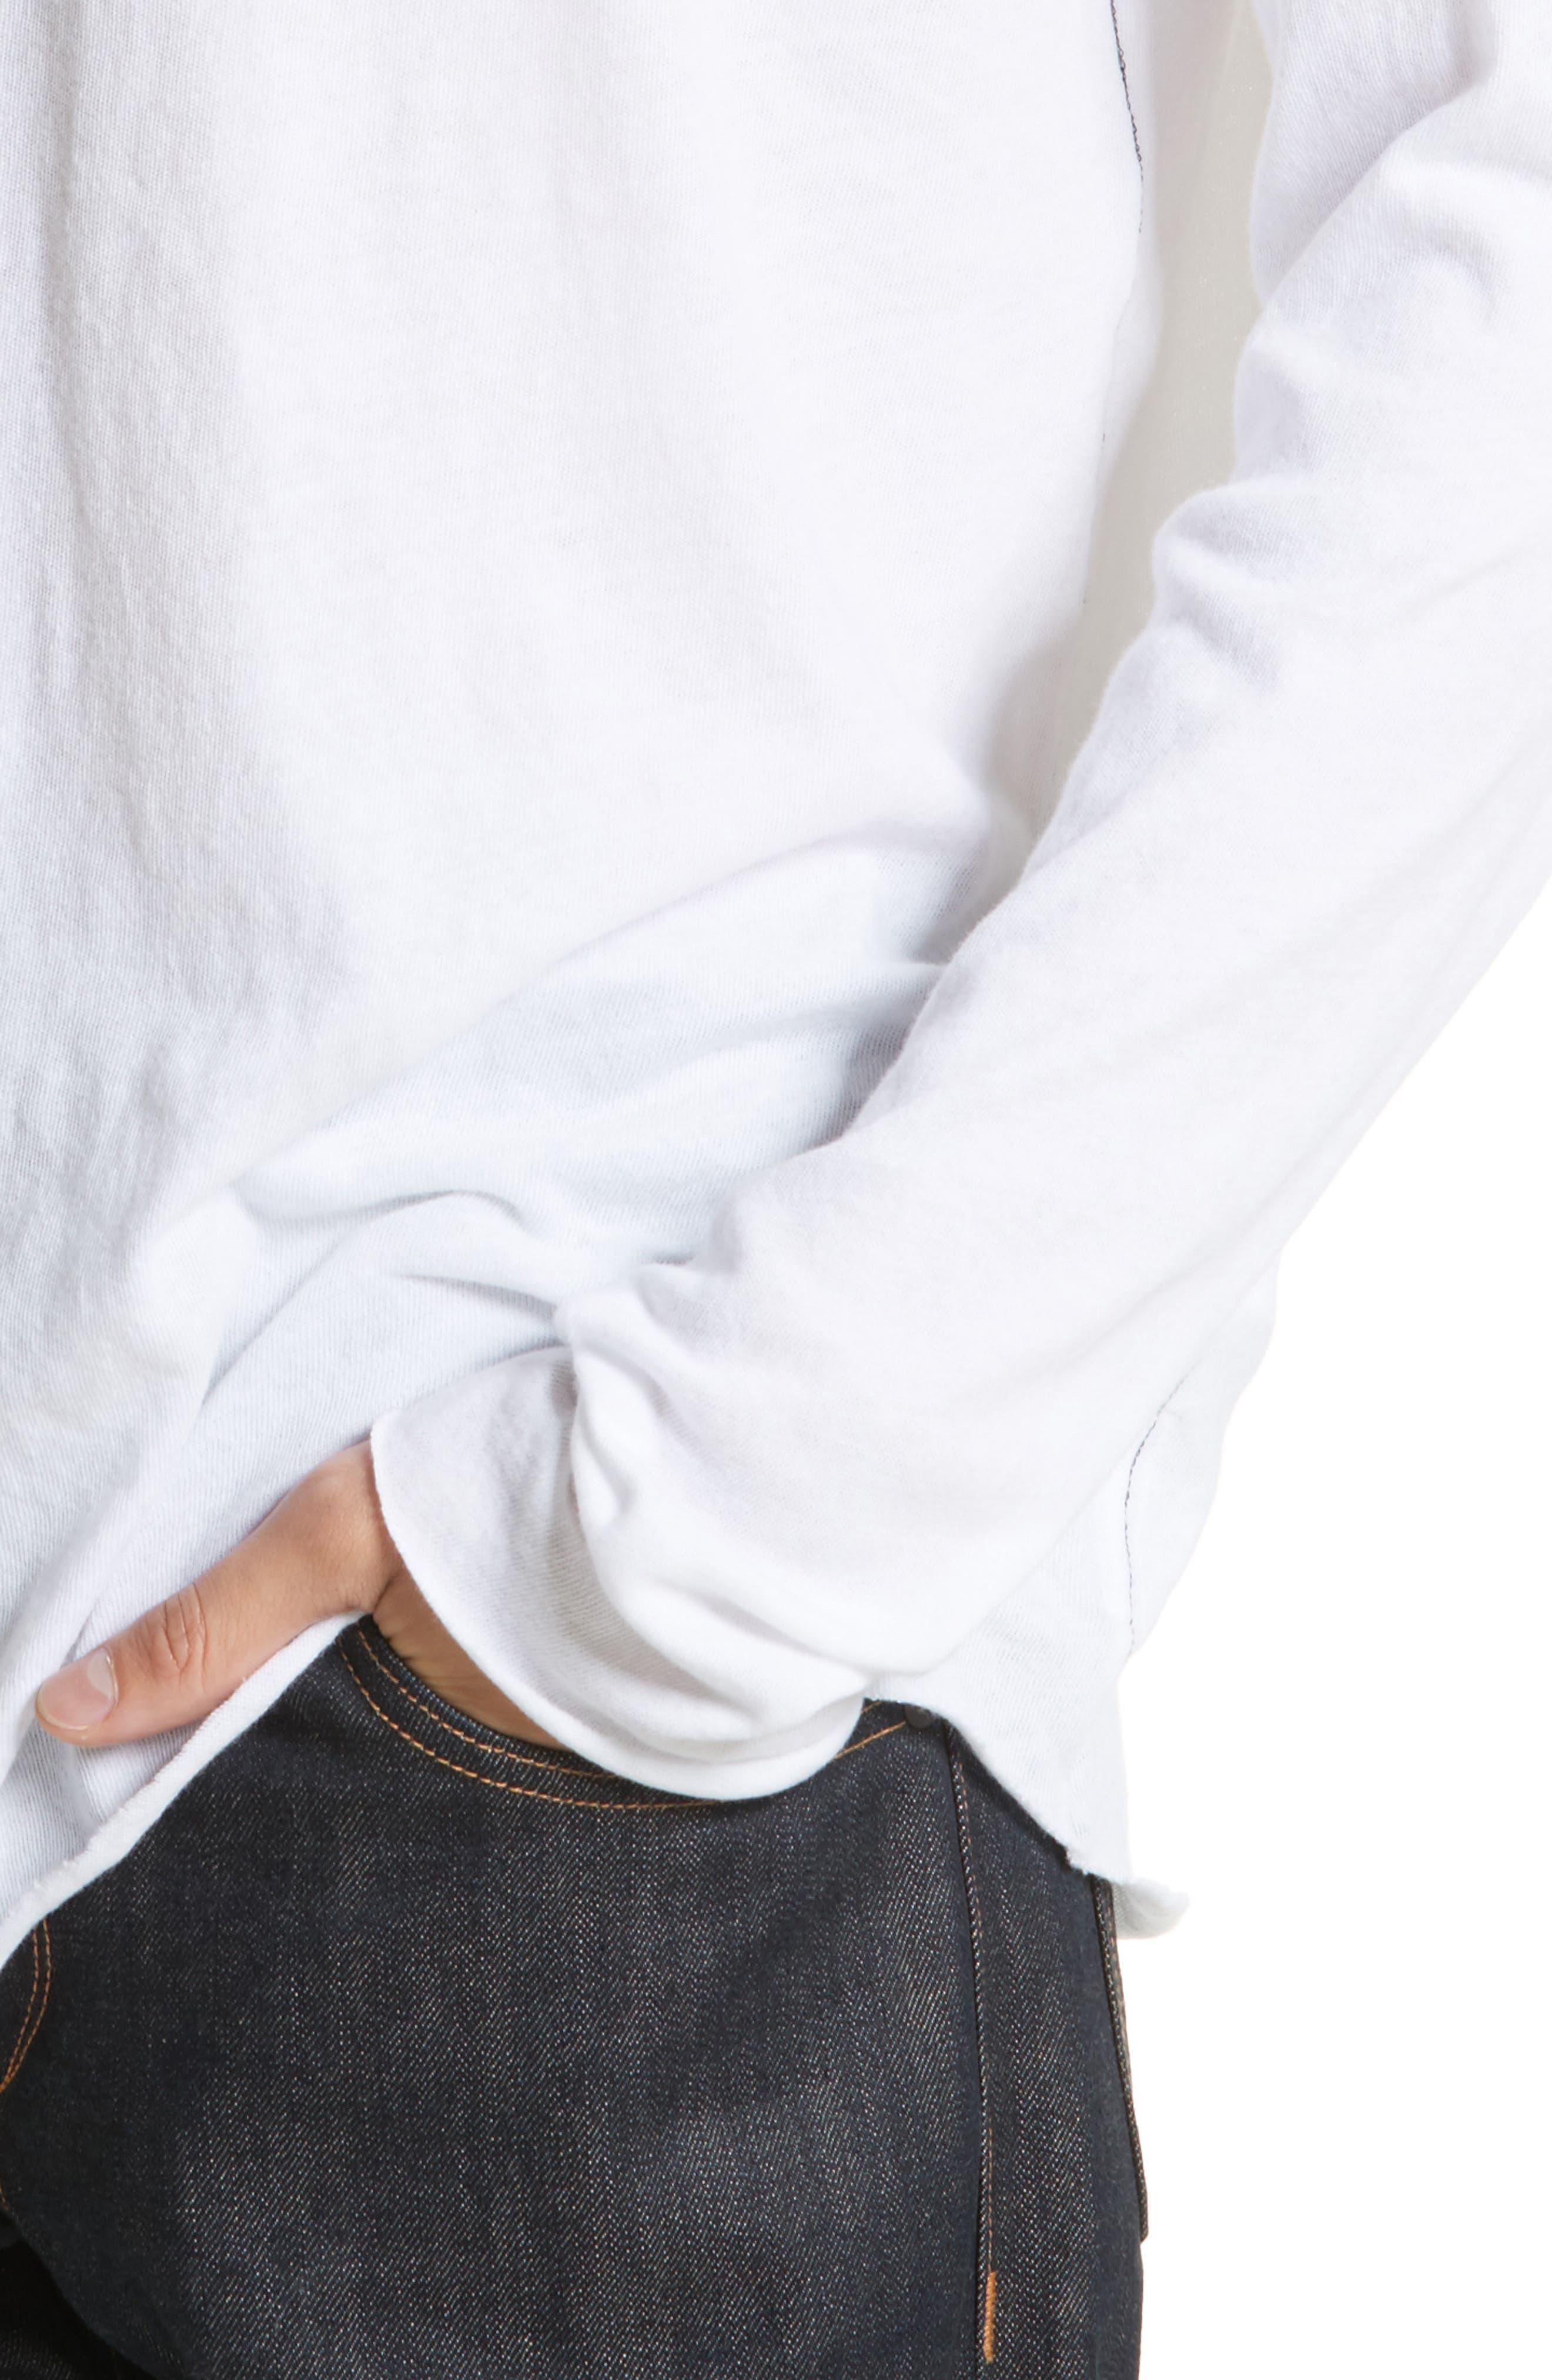 Rupert Long Sleeve T-Shirt,                             Alternate thumbnail 4, color,                             100